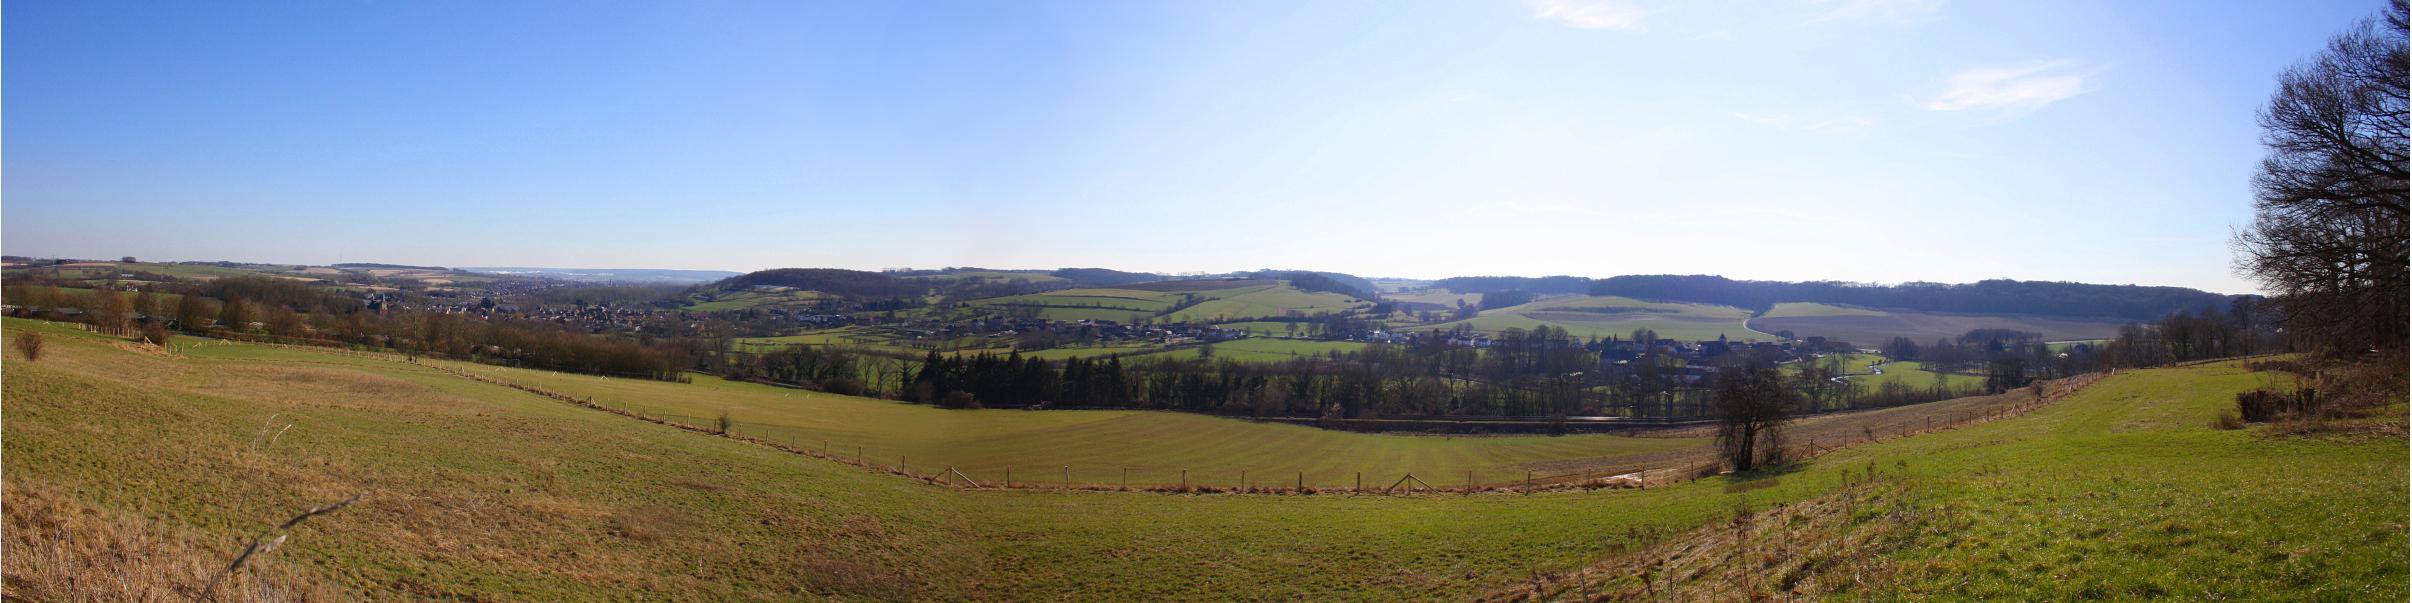 Panorama heuvelland Maurice van Bruggen.JPG